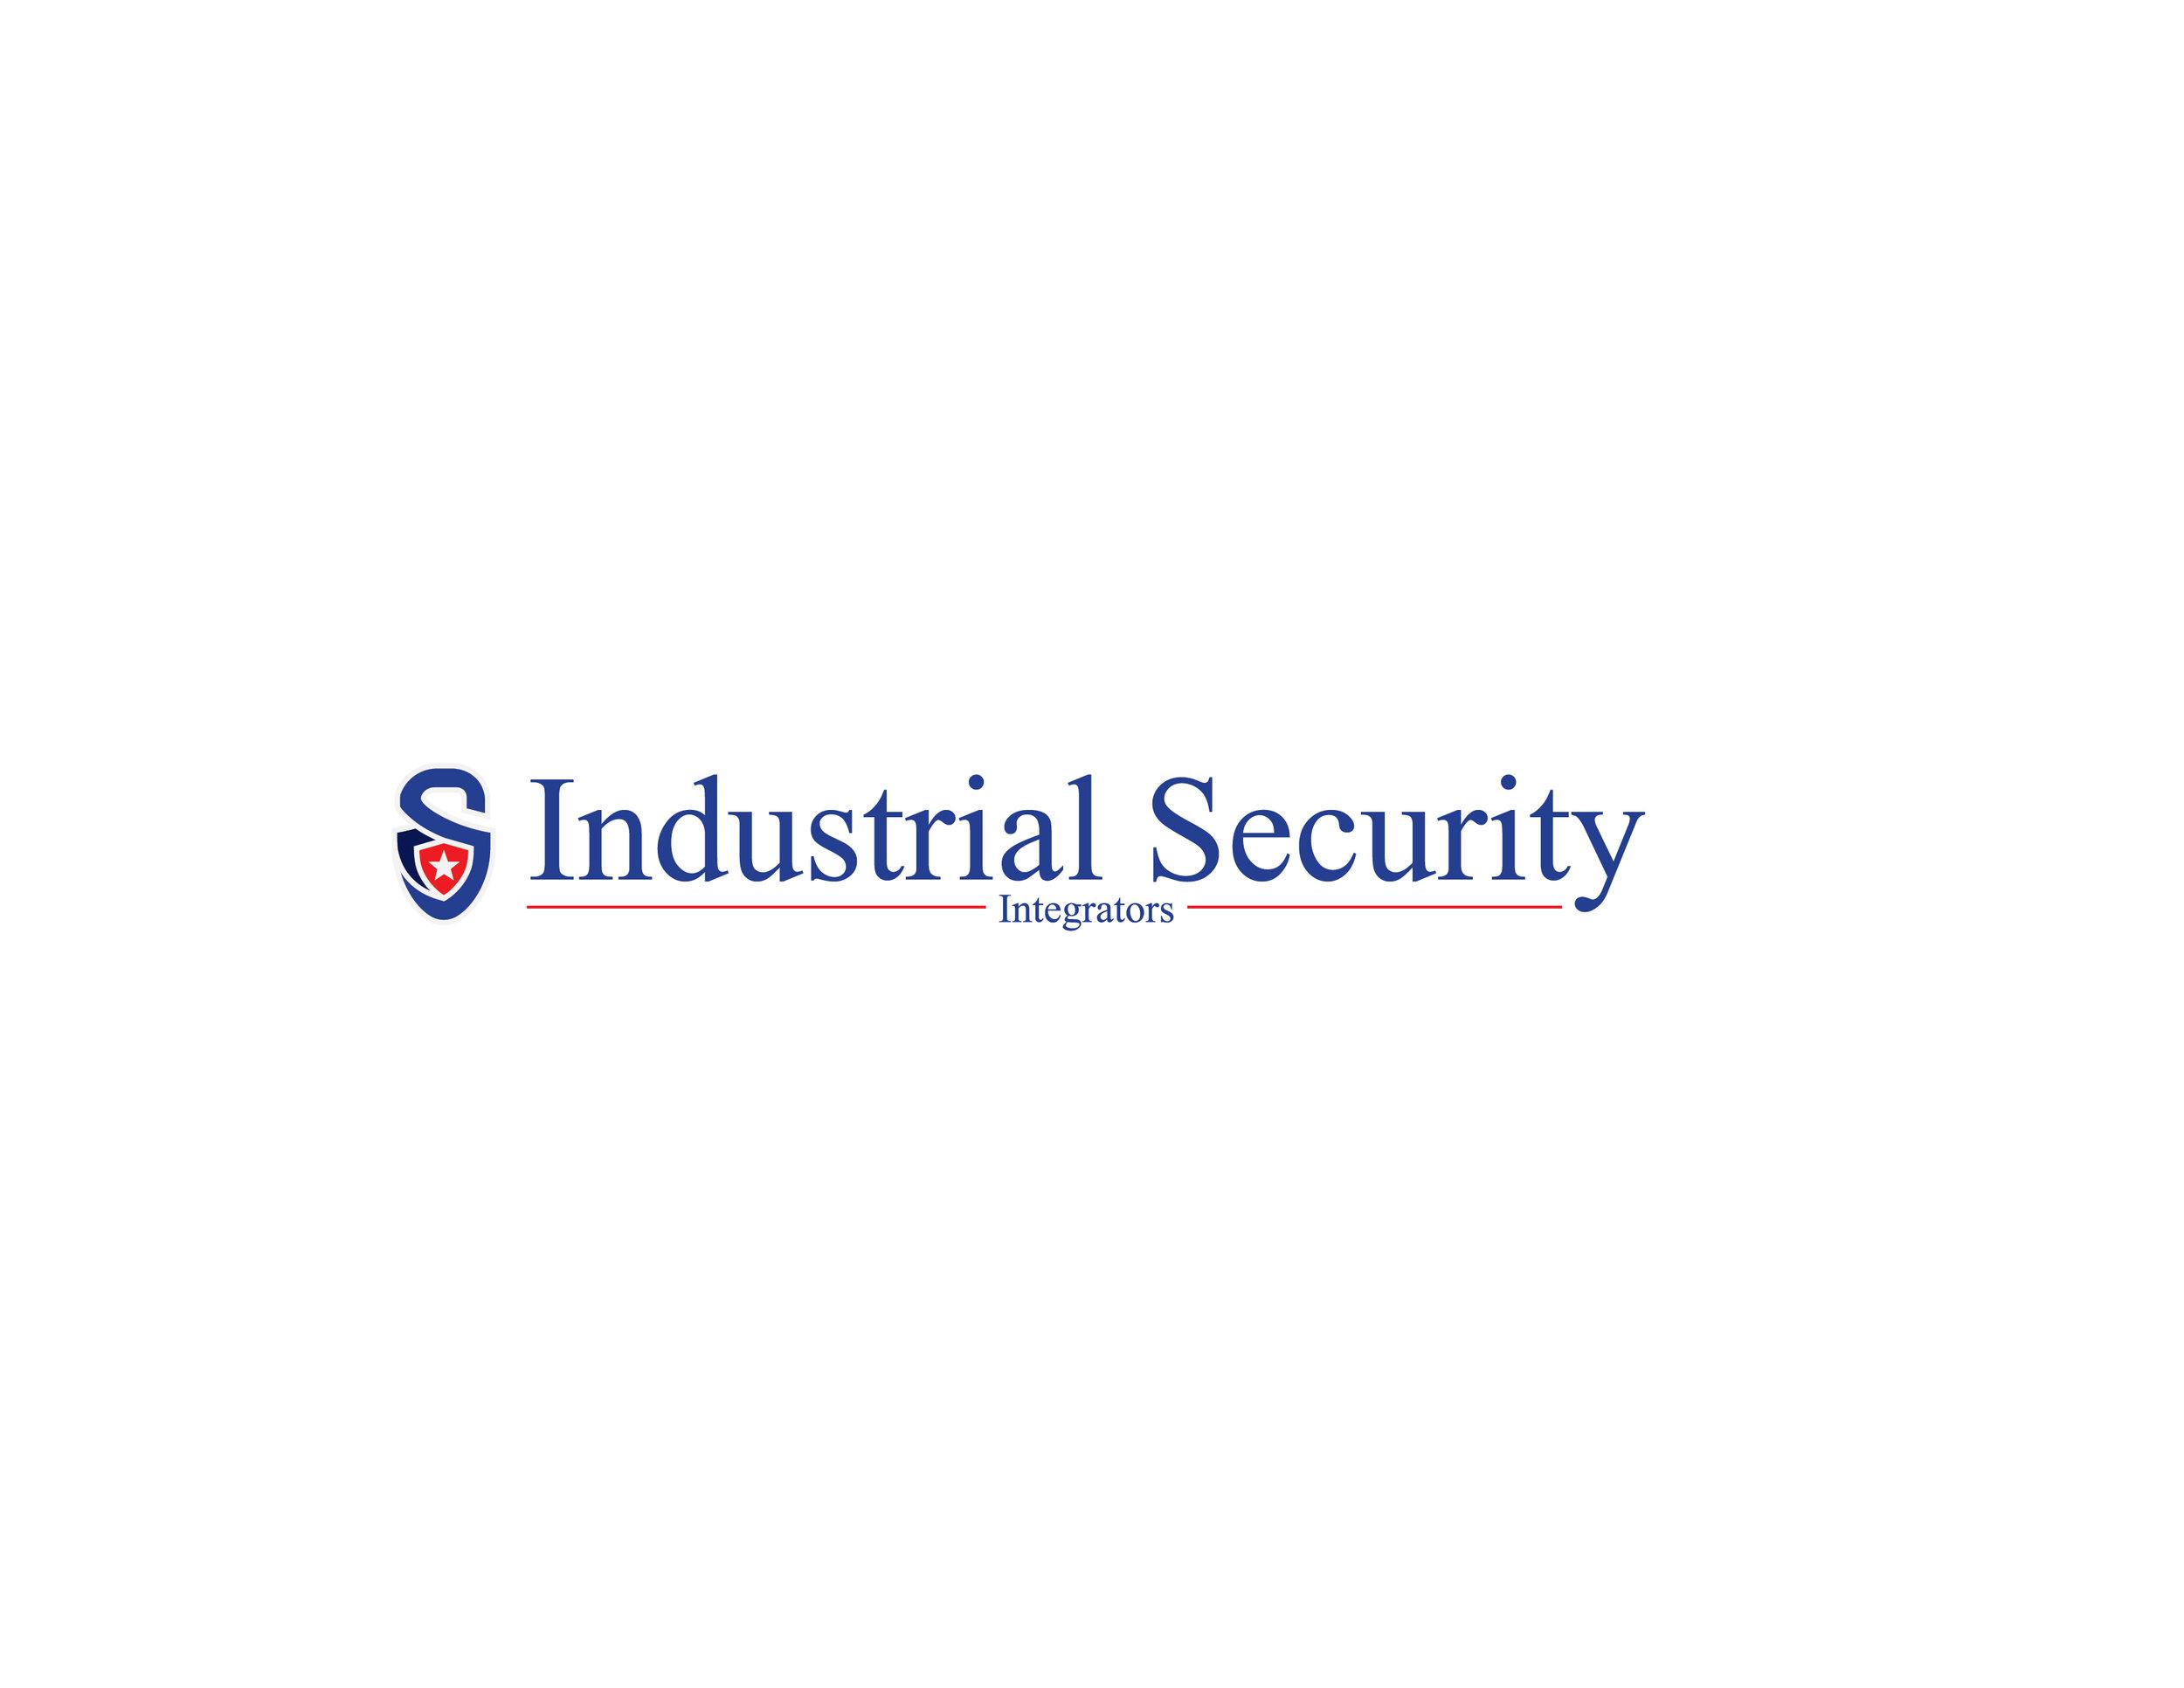 Industrial Security Integrators-Web-2.jpg